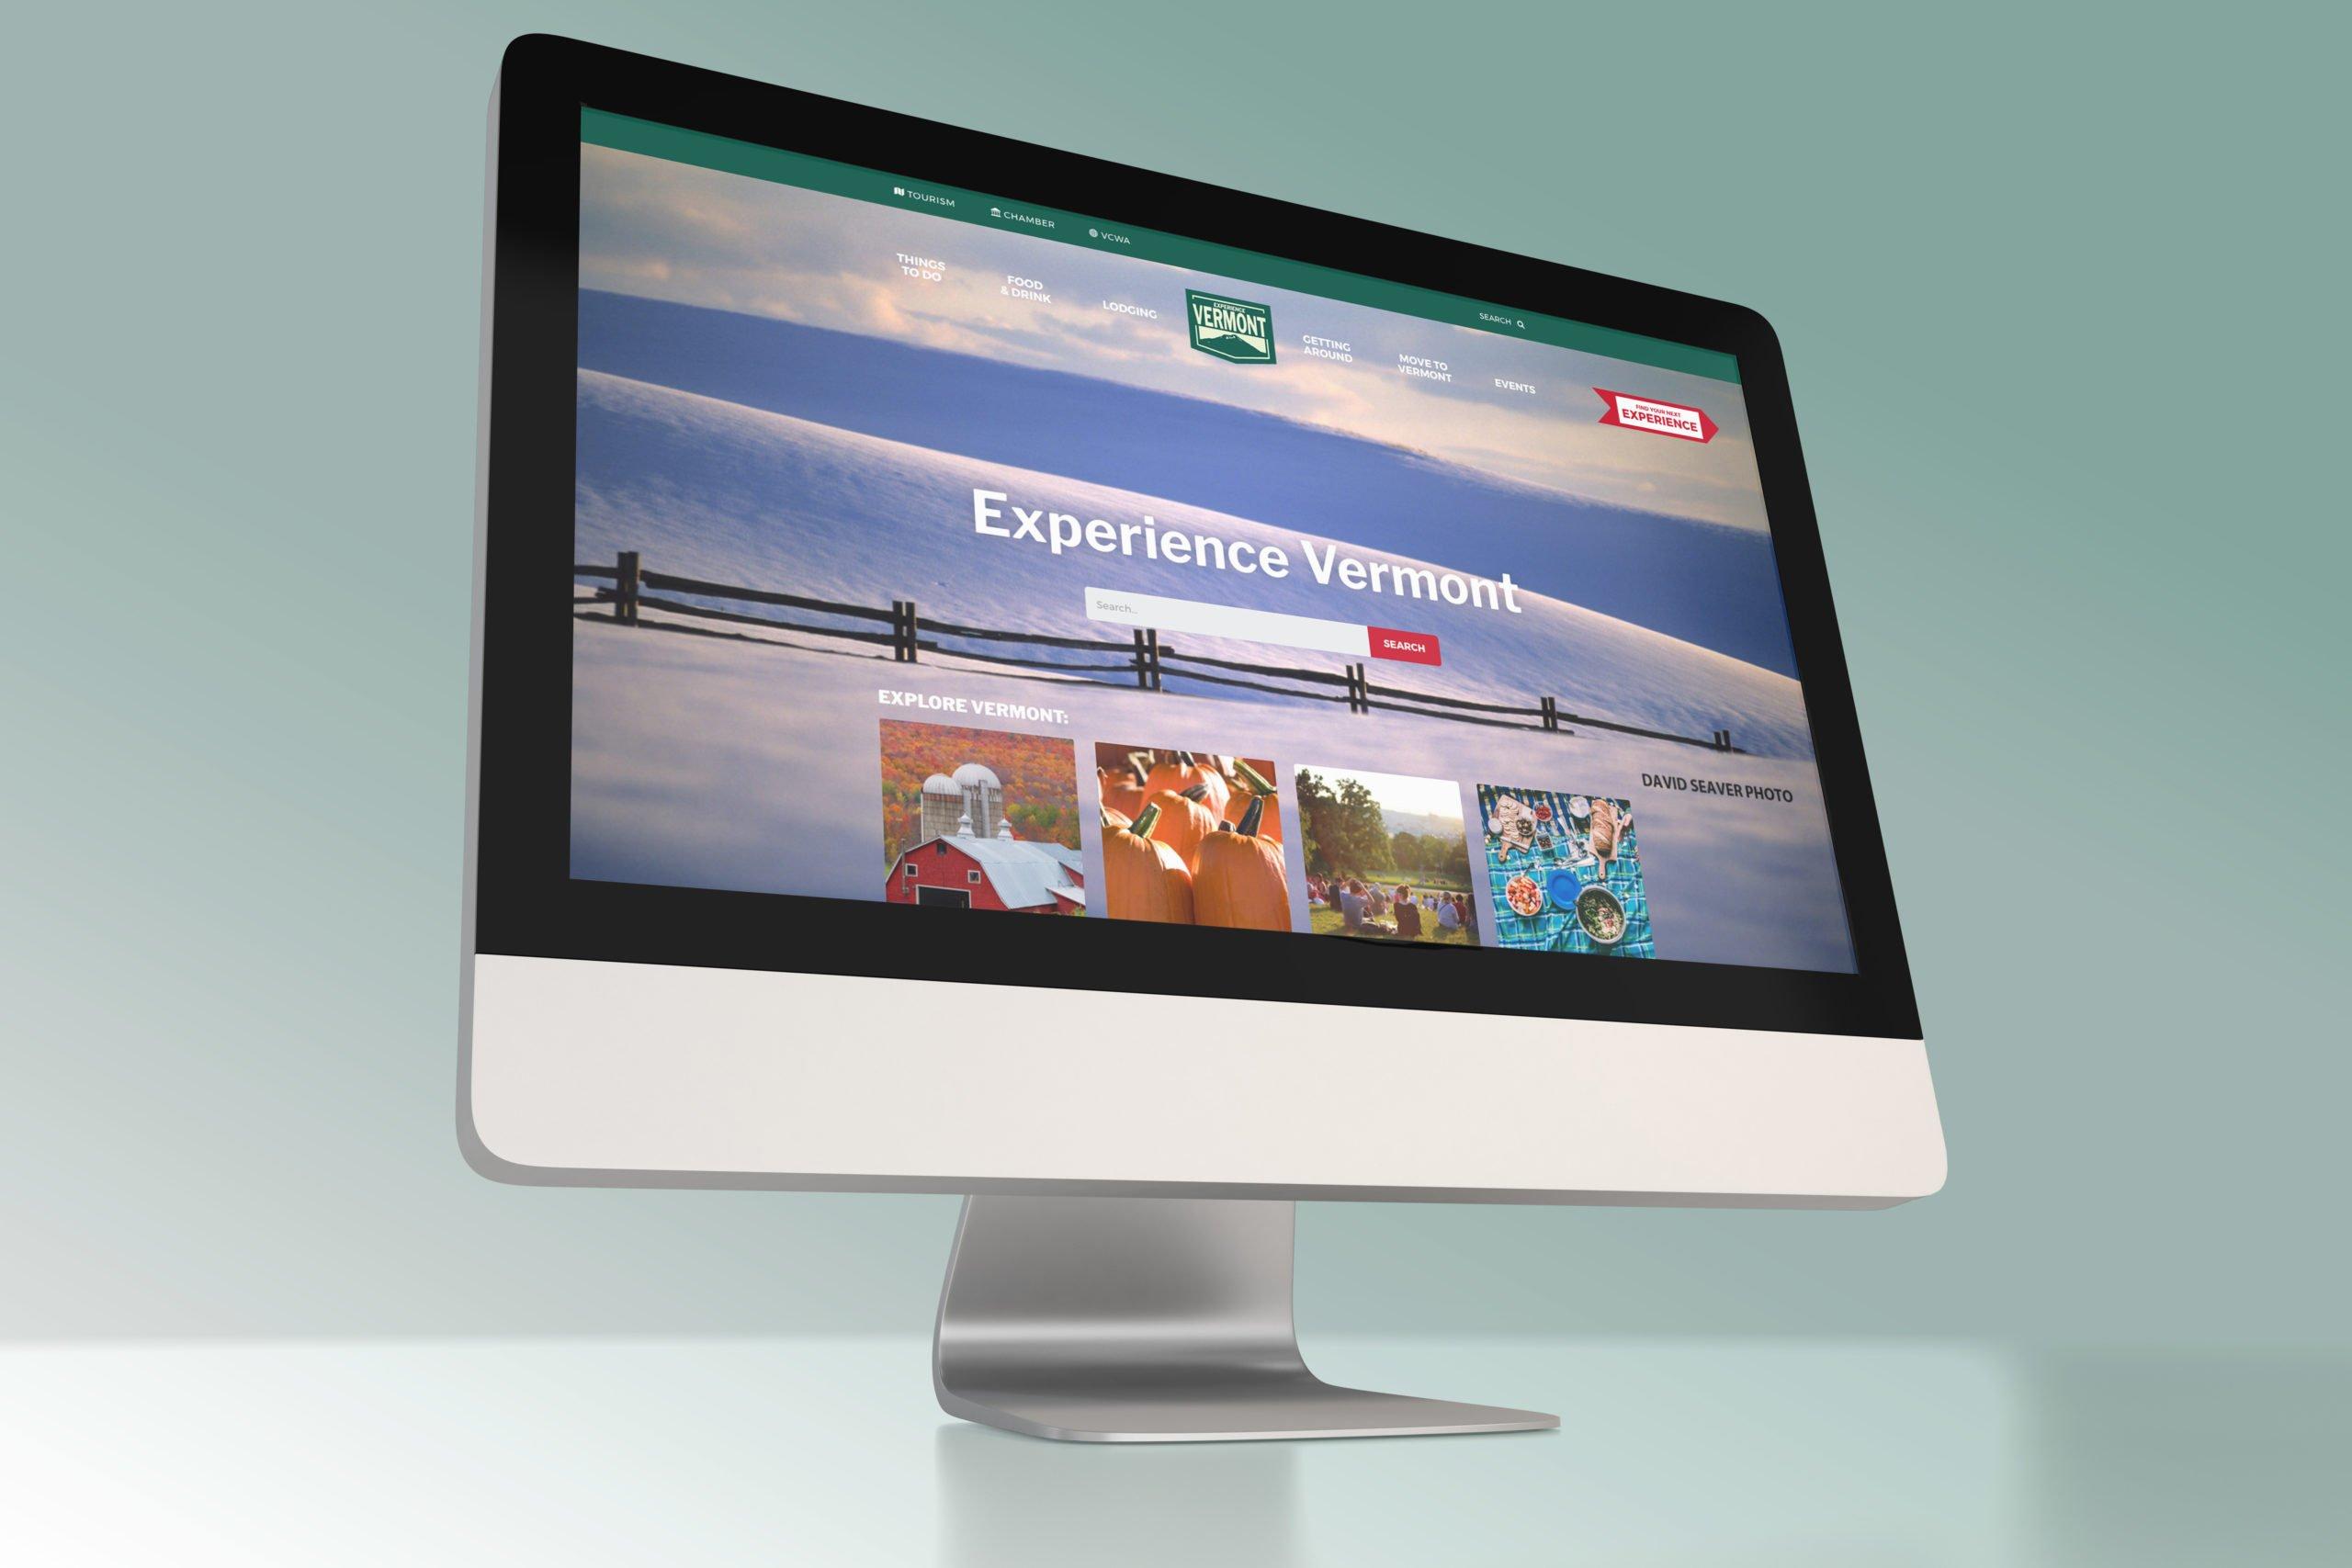 vermont.org website on desktop